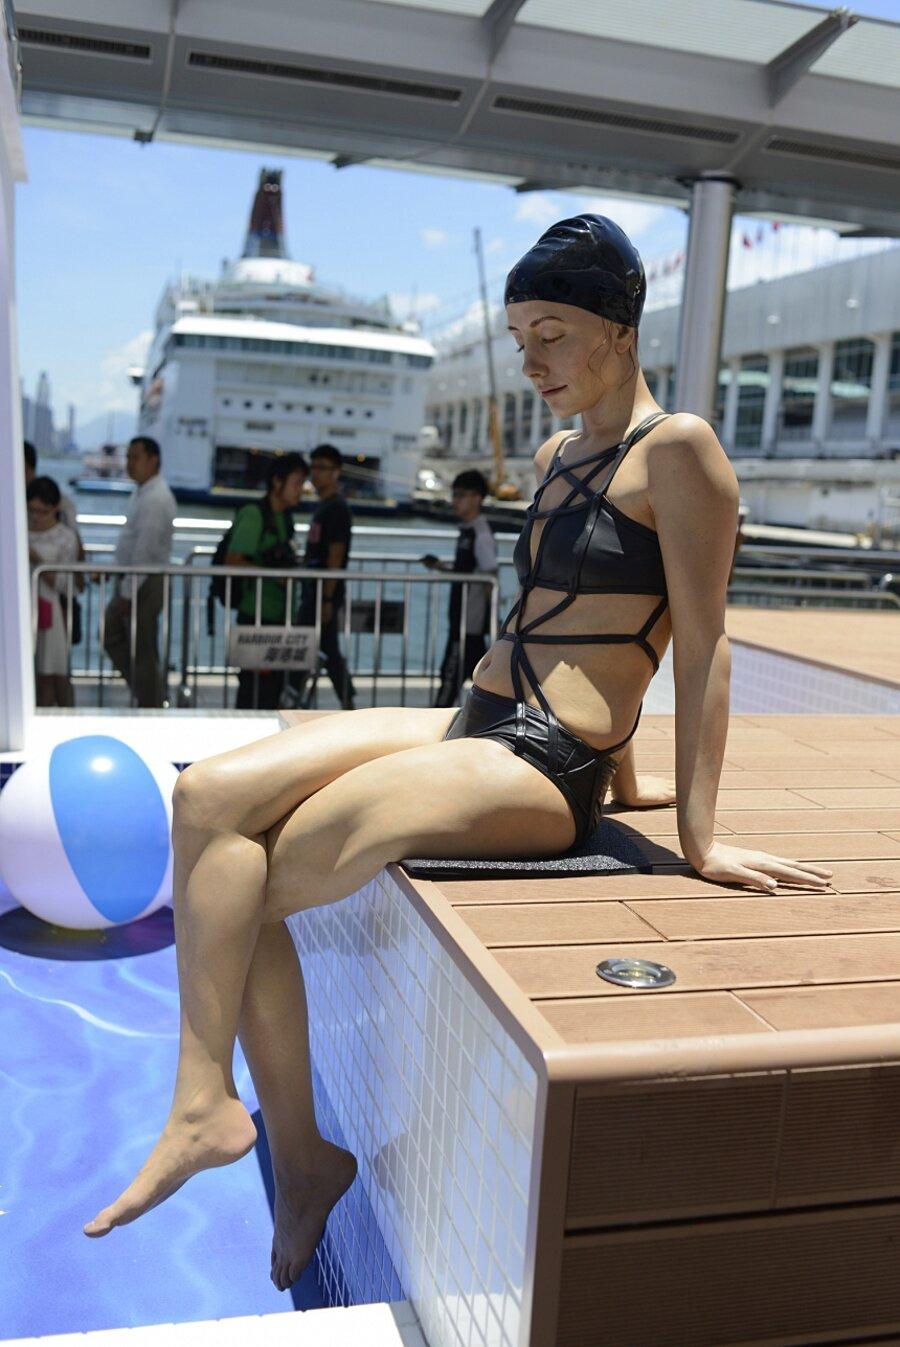 sculture-iperrealismo-donne-nuotatrici-carol-feuerman-02-keb